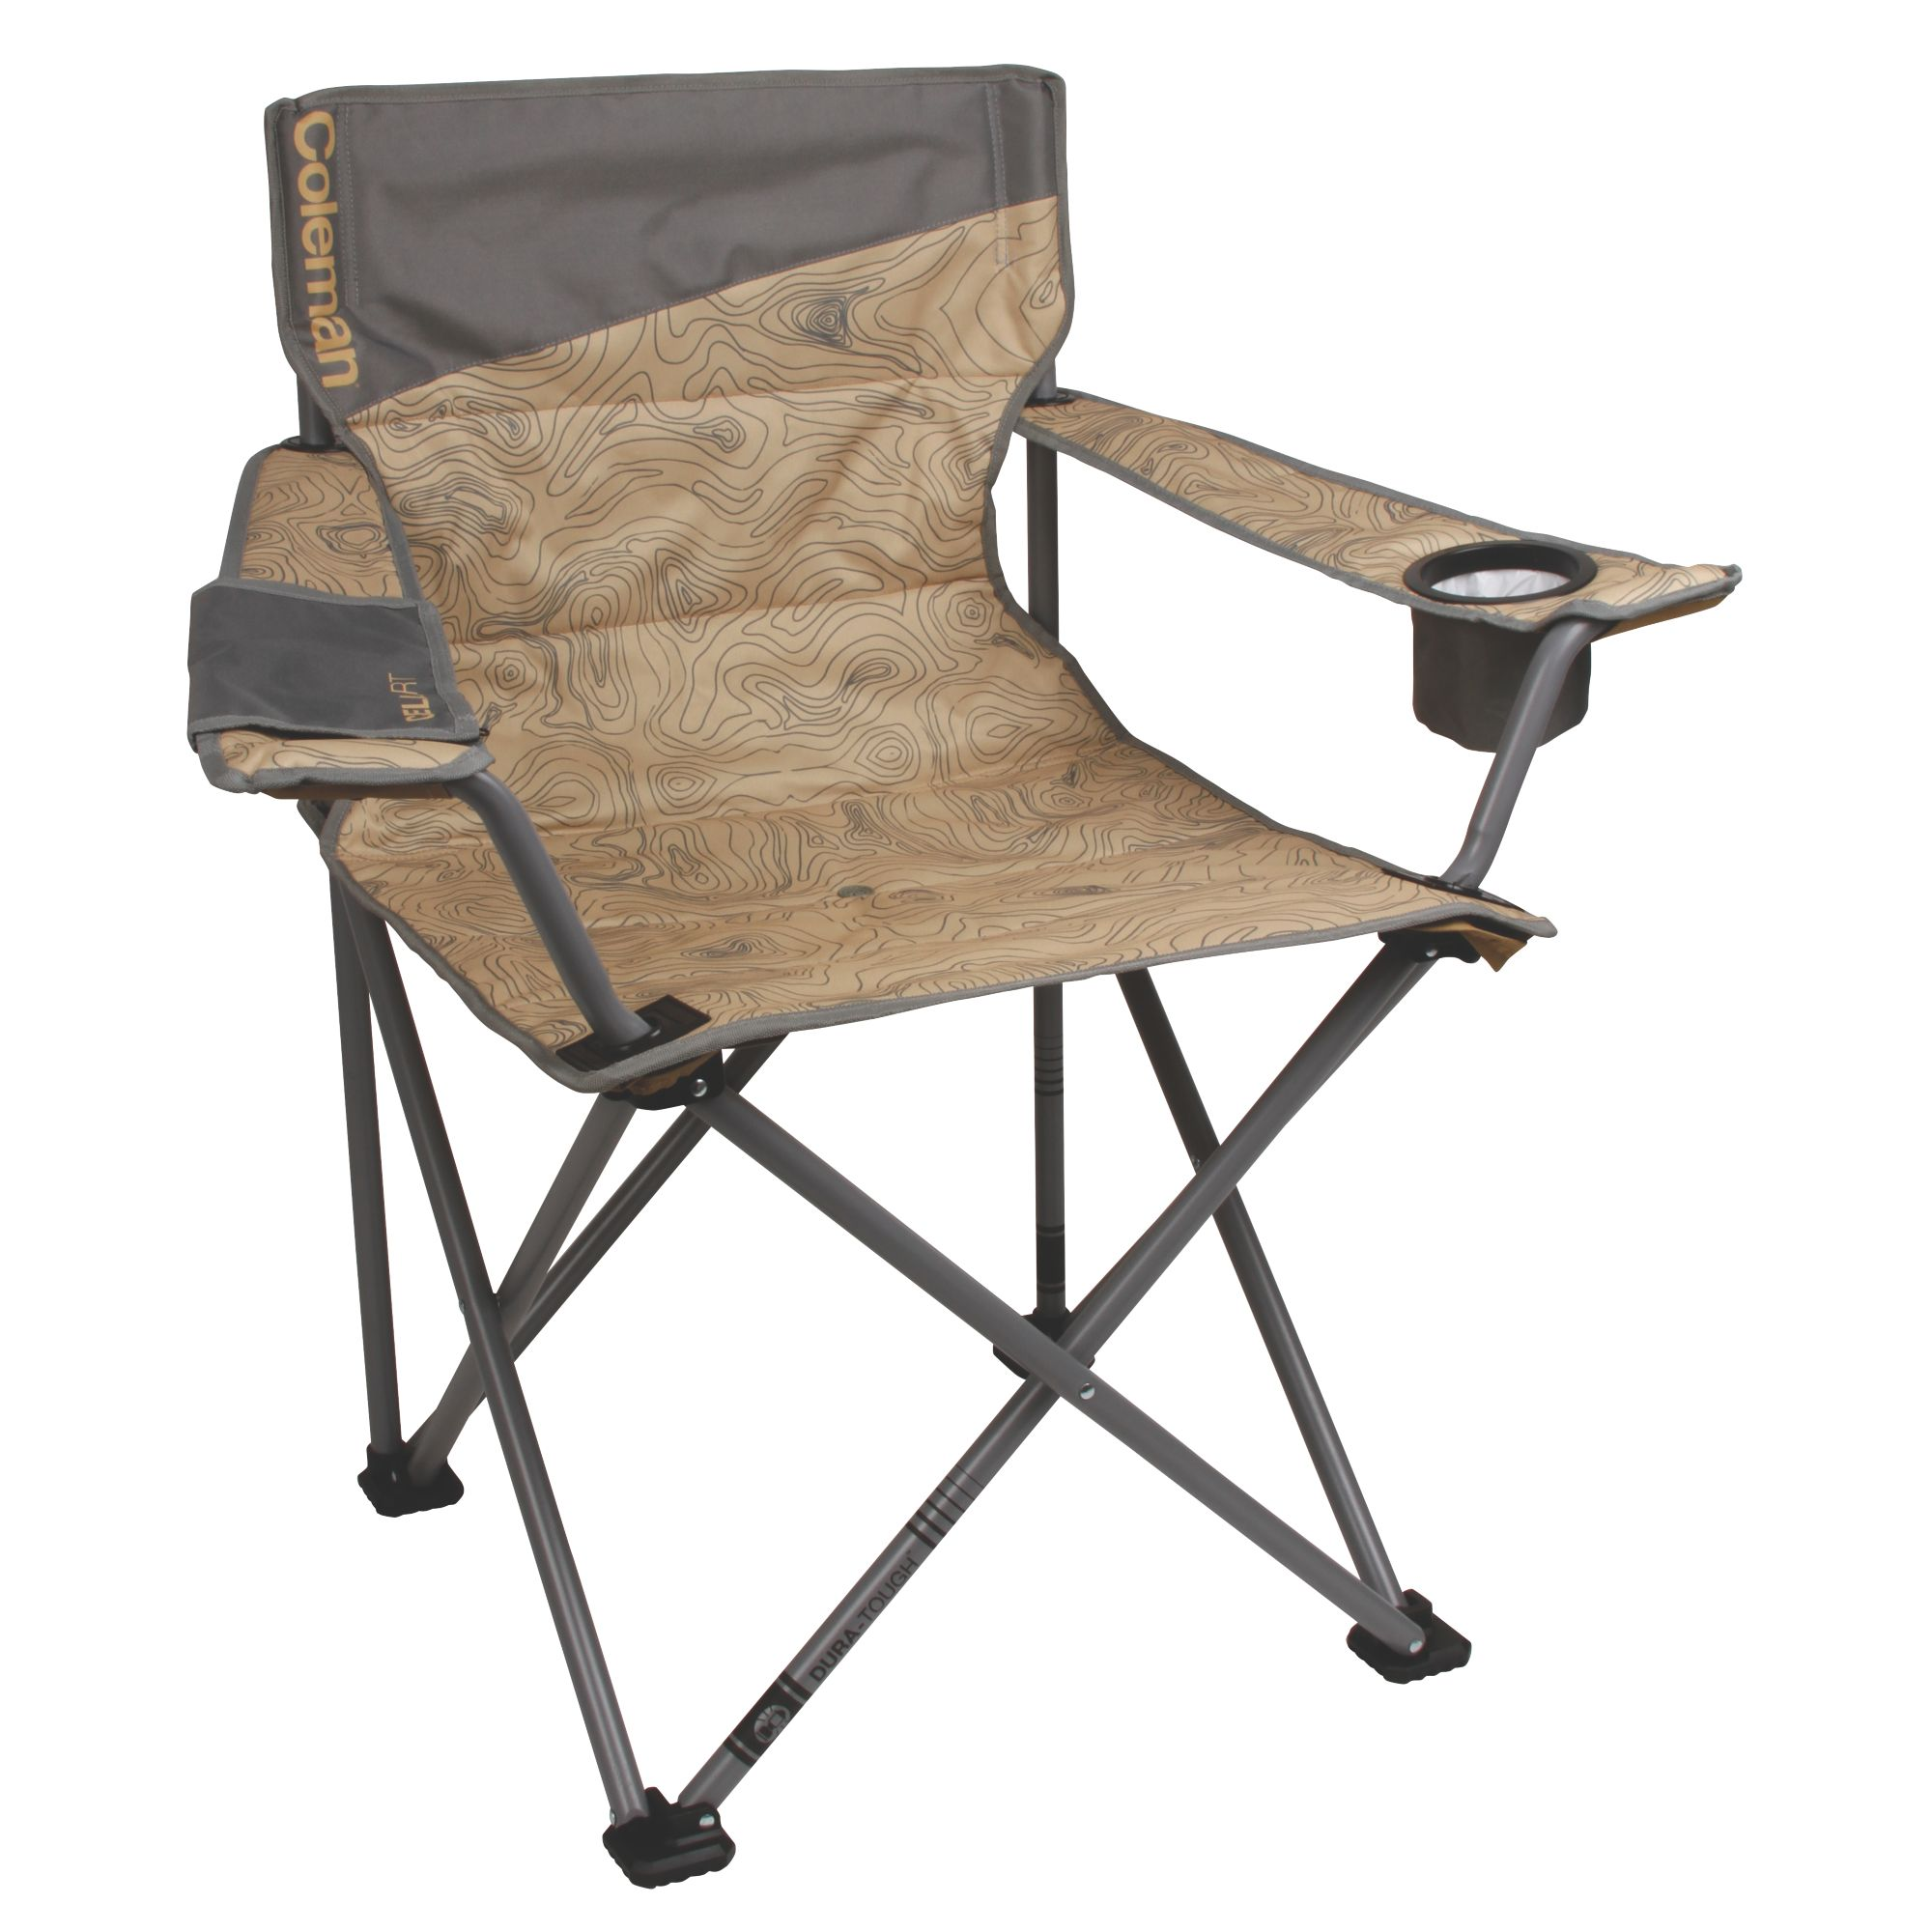 Coleman camp chairs - Big N Tall Quad Chair